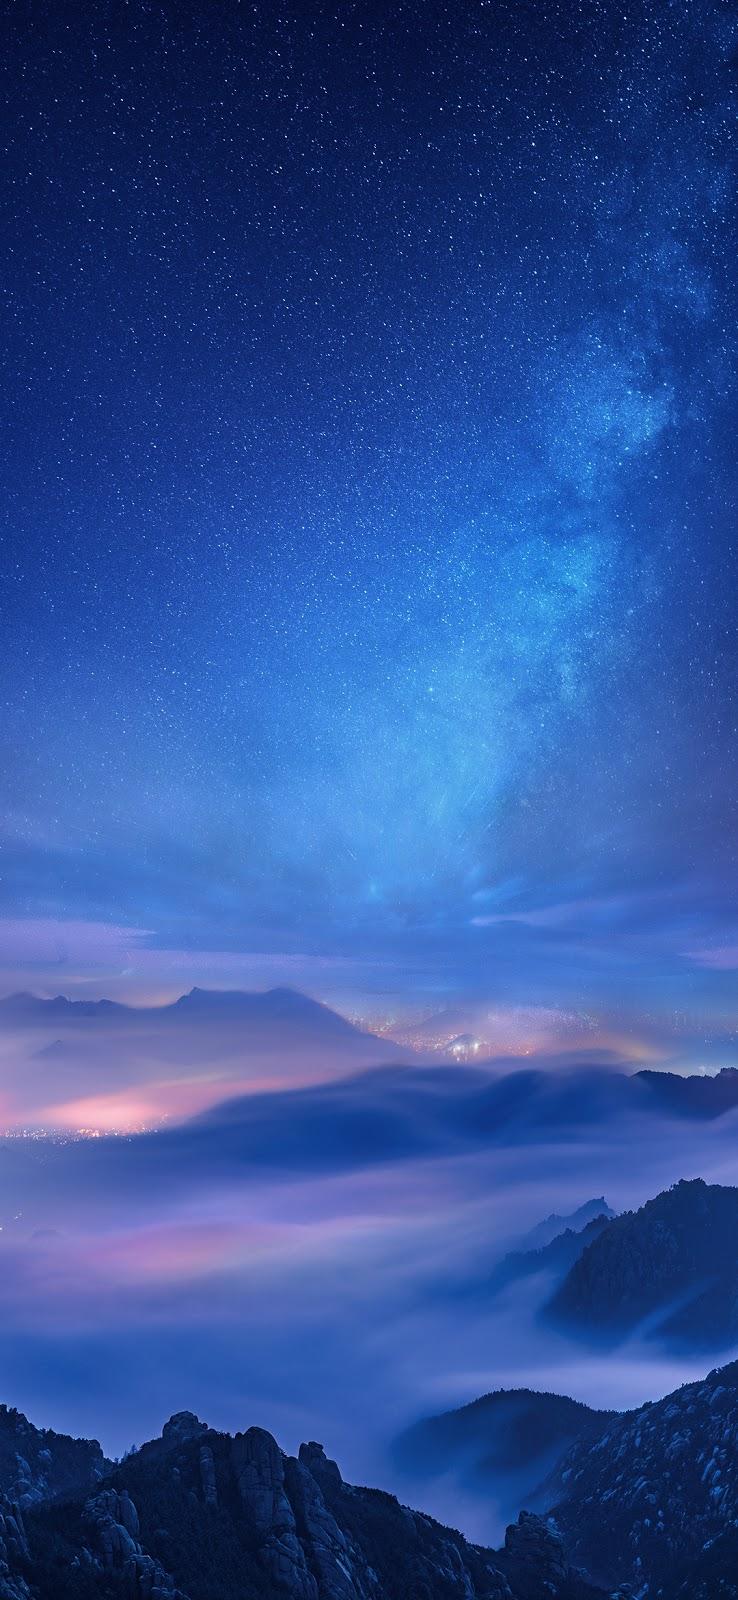 Milky night